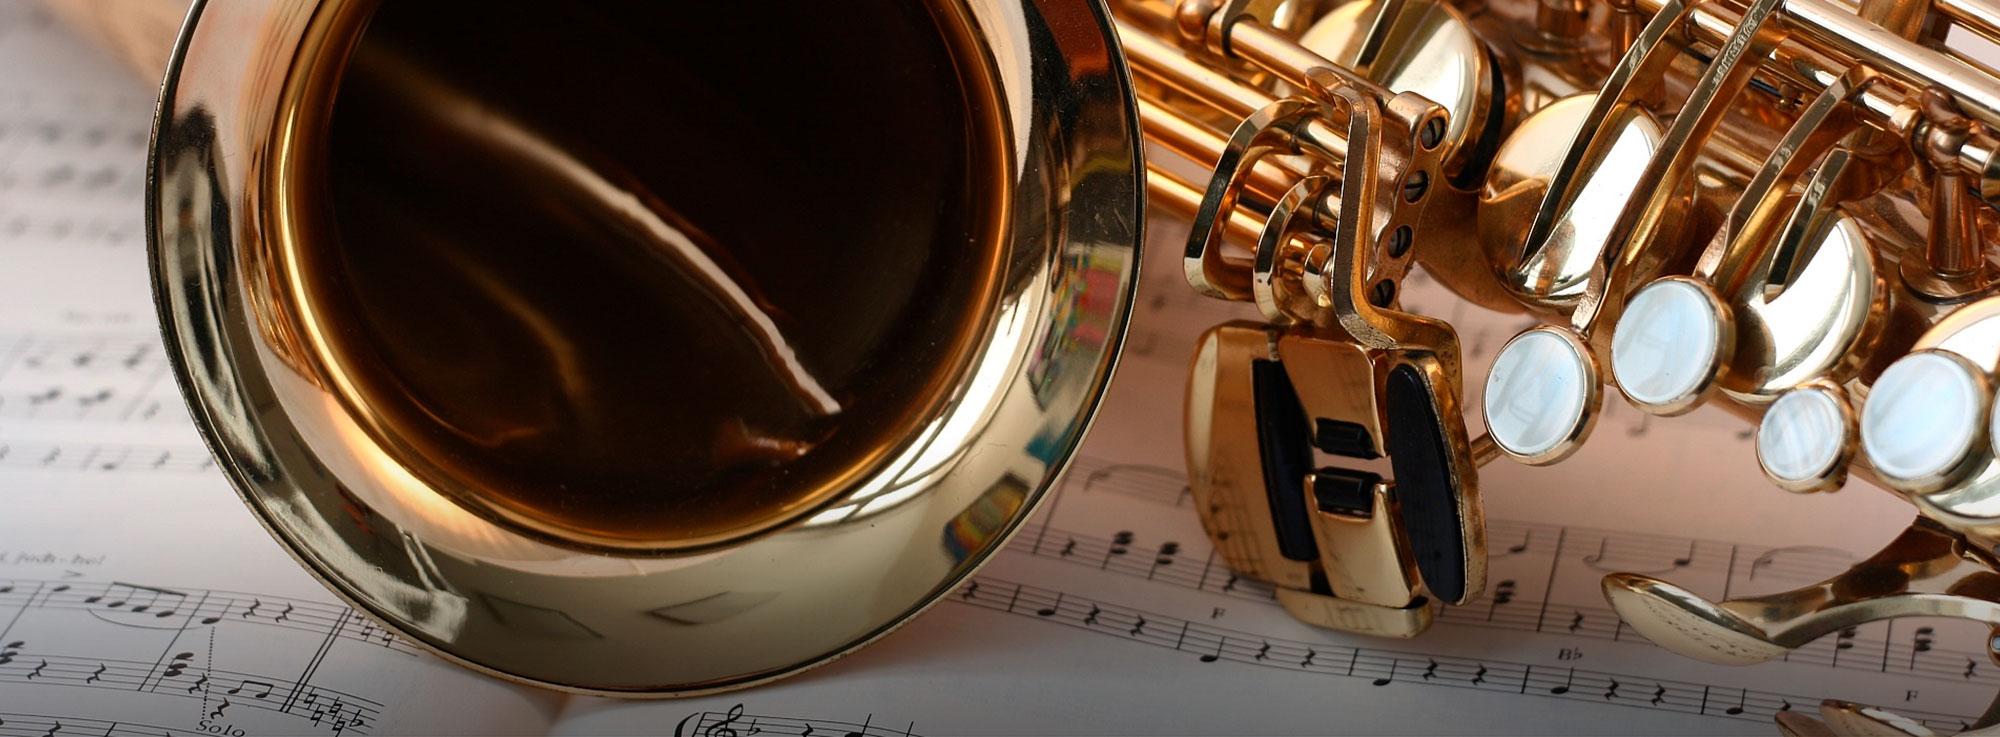 Provincia di Bari: Bari in Jazz 2018